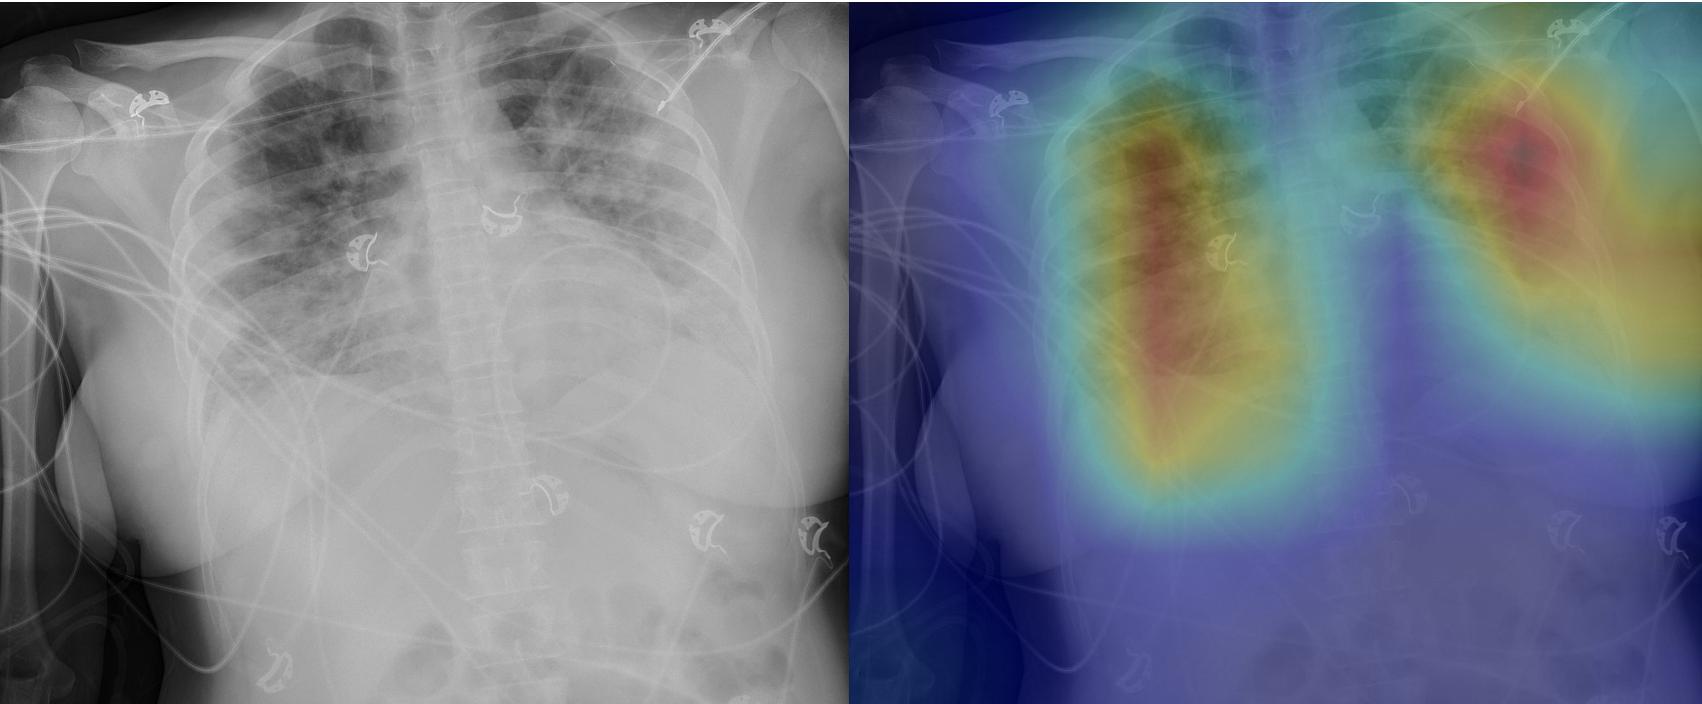 X-ray image of COVID-19 pneumonia